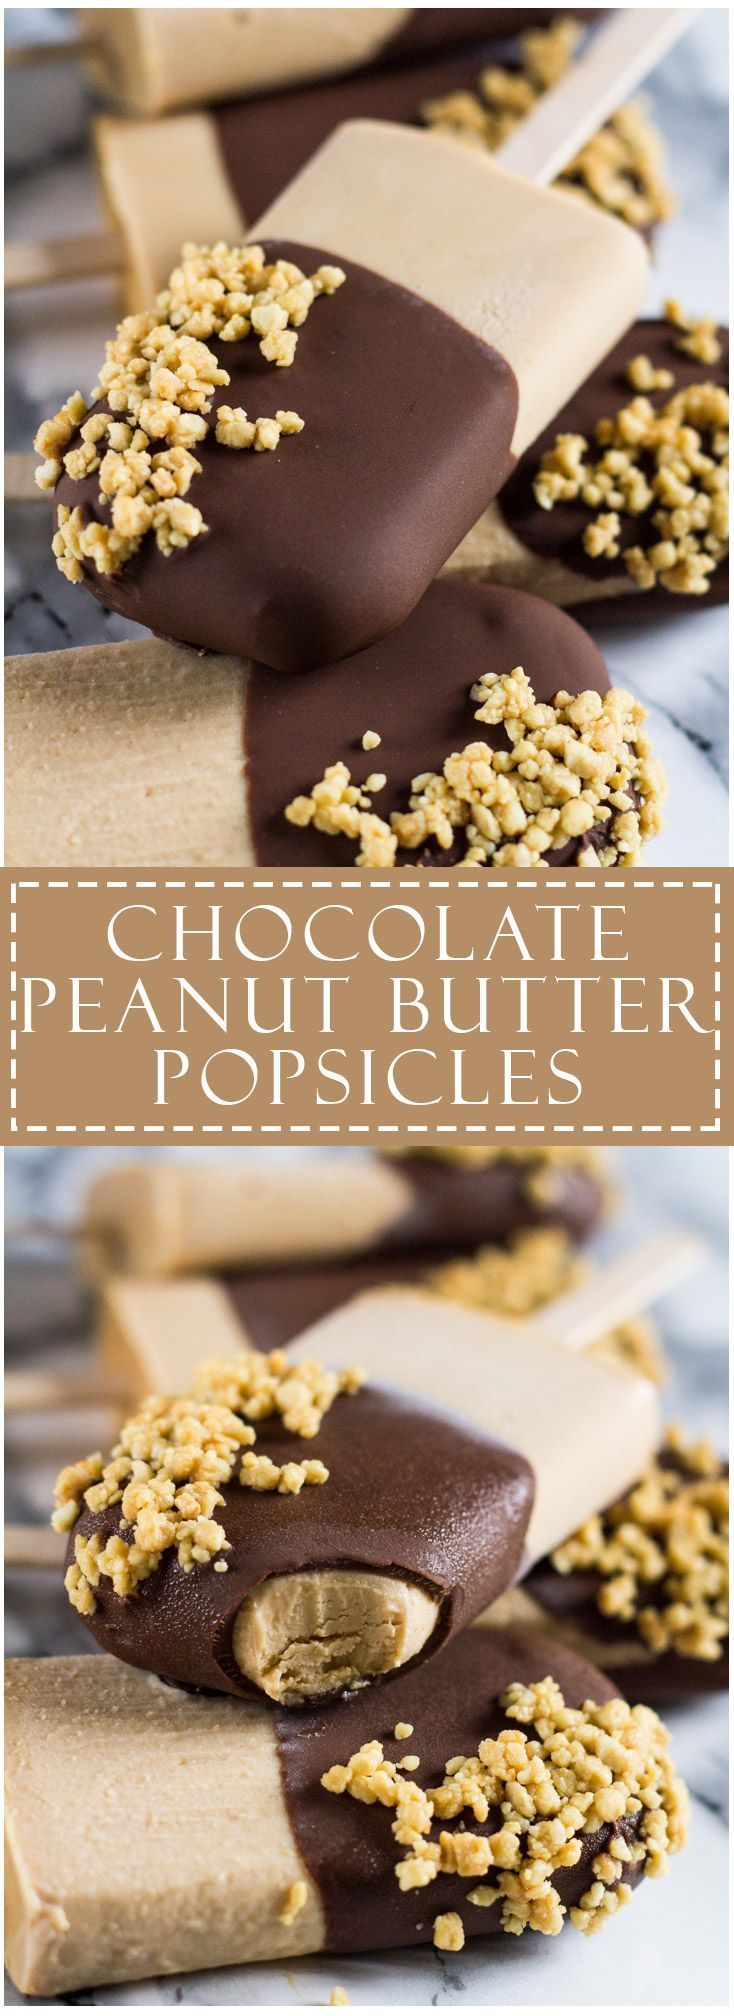 Chocolate Peanut Butter Yoghurt Popsicles | (veganise it) marshasbakingaddiction.com…